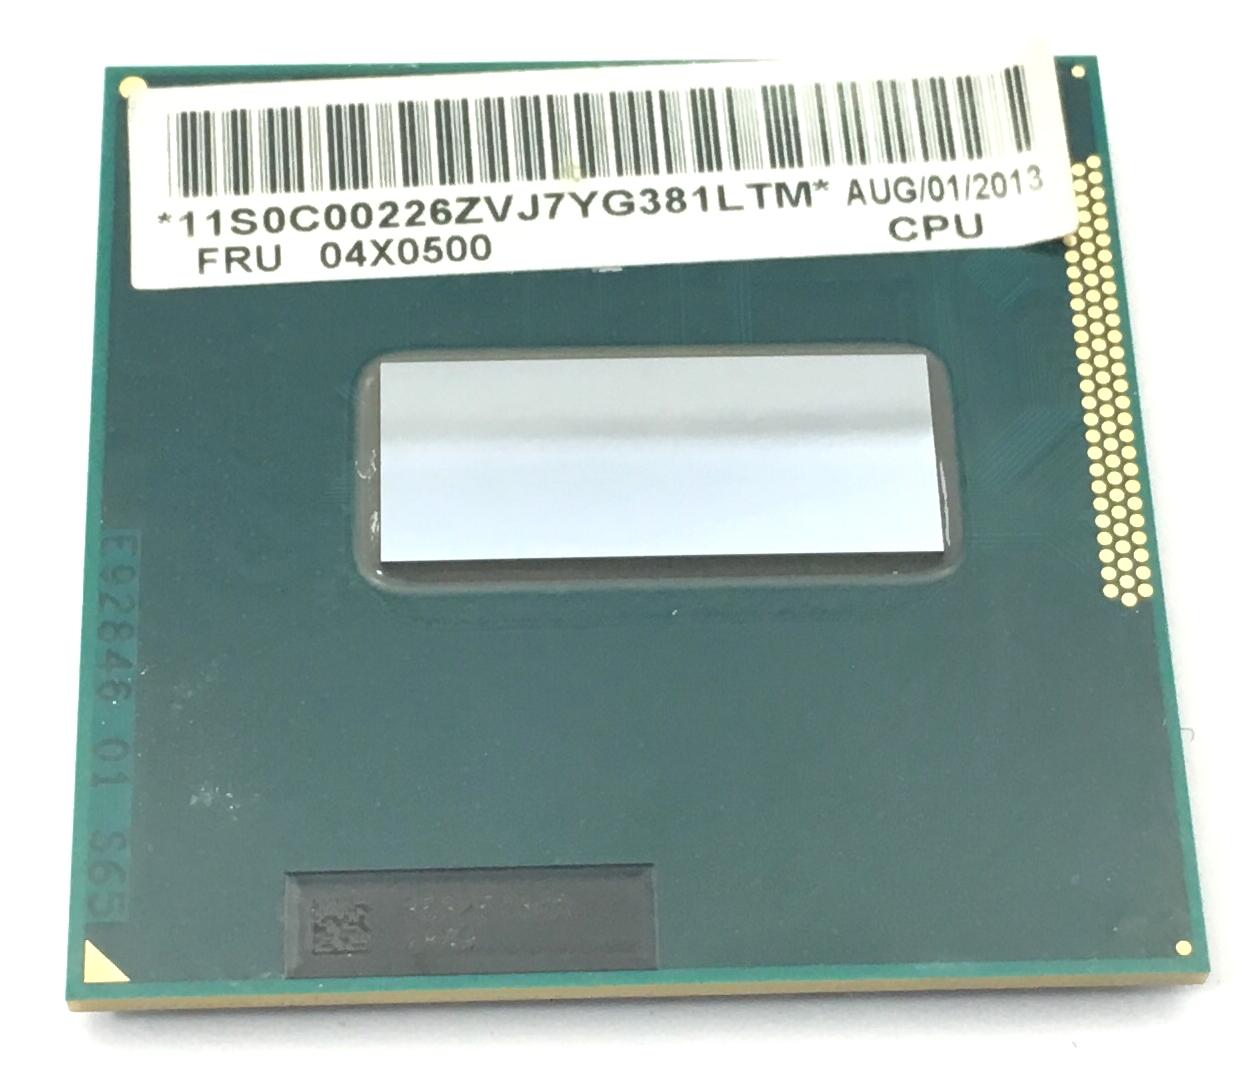 IBM Intel I7-3840Qm 2.8GHz 4Core 8Mb Pga988 Processor (04X0500)